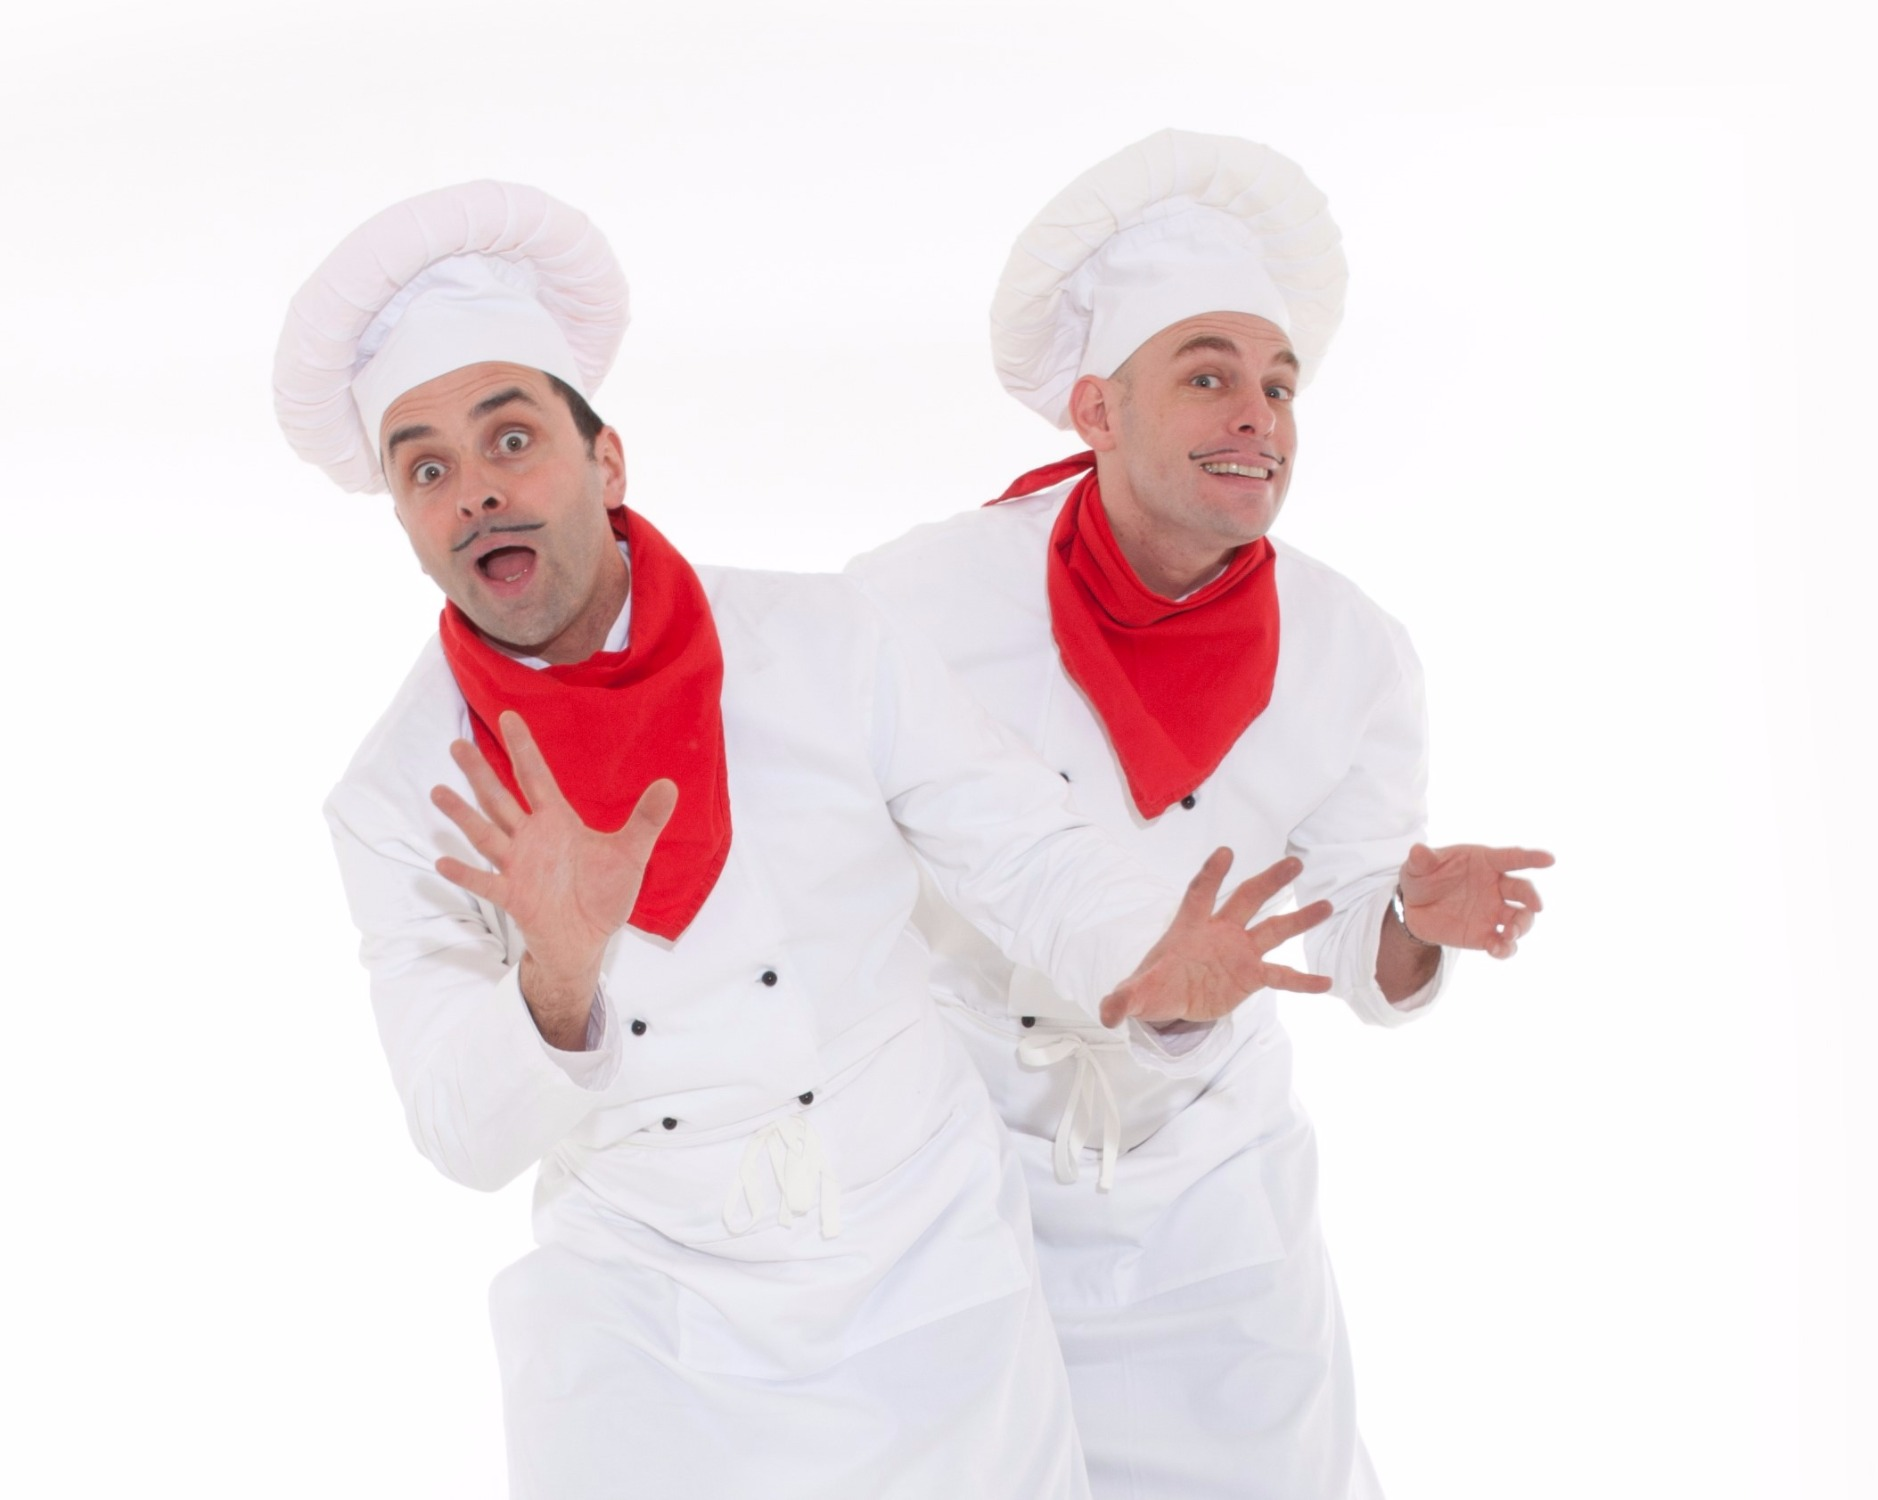 Promo Comedy Waiters Comedy Waiters Oxfordshire